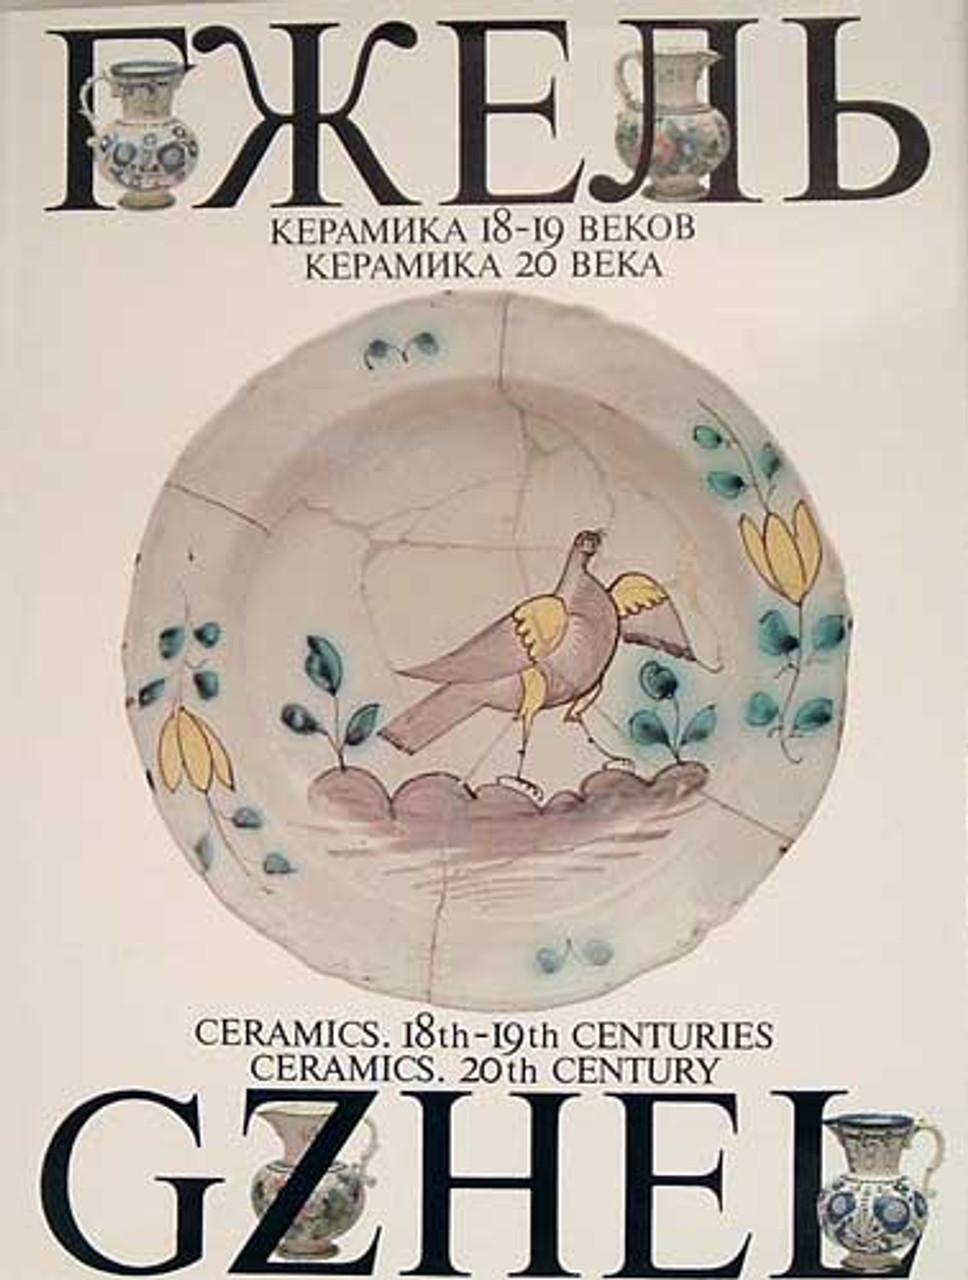 Gzhel: Ceramics 18th-19th-20th Centuries